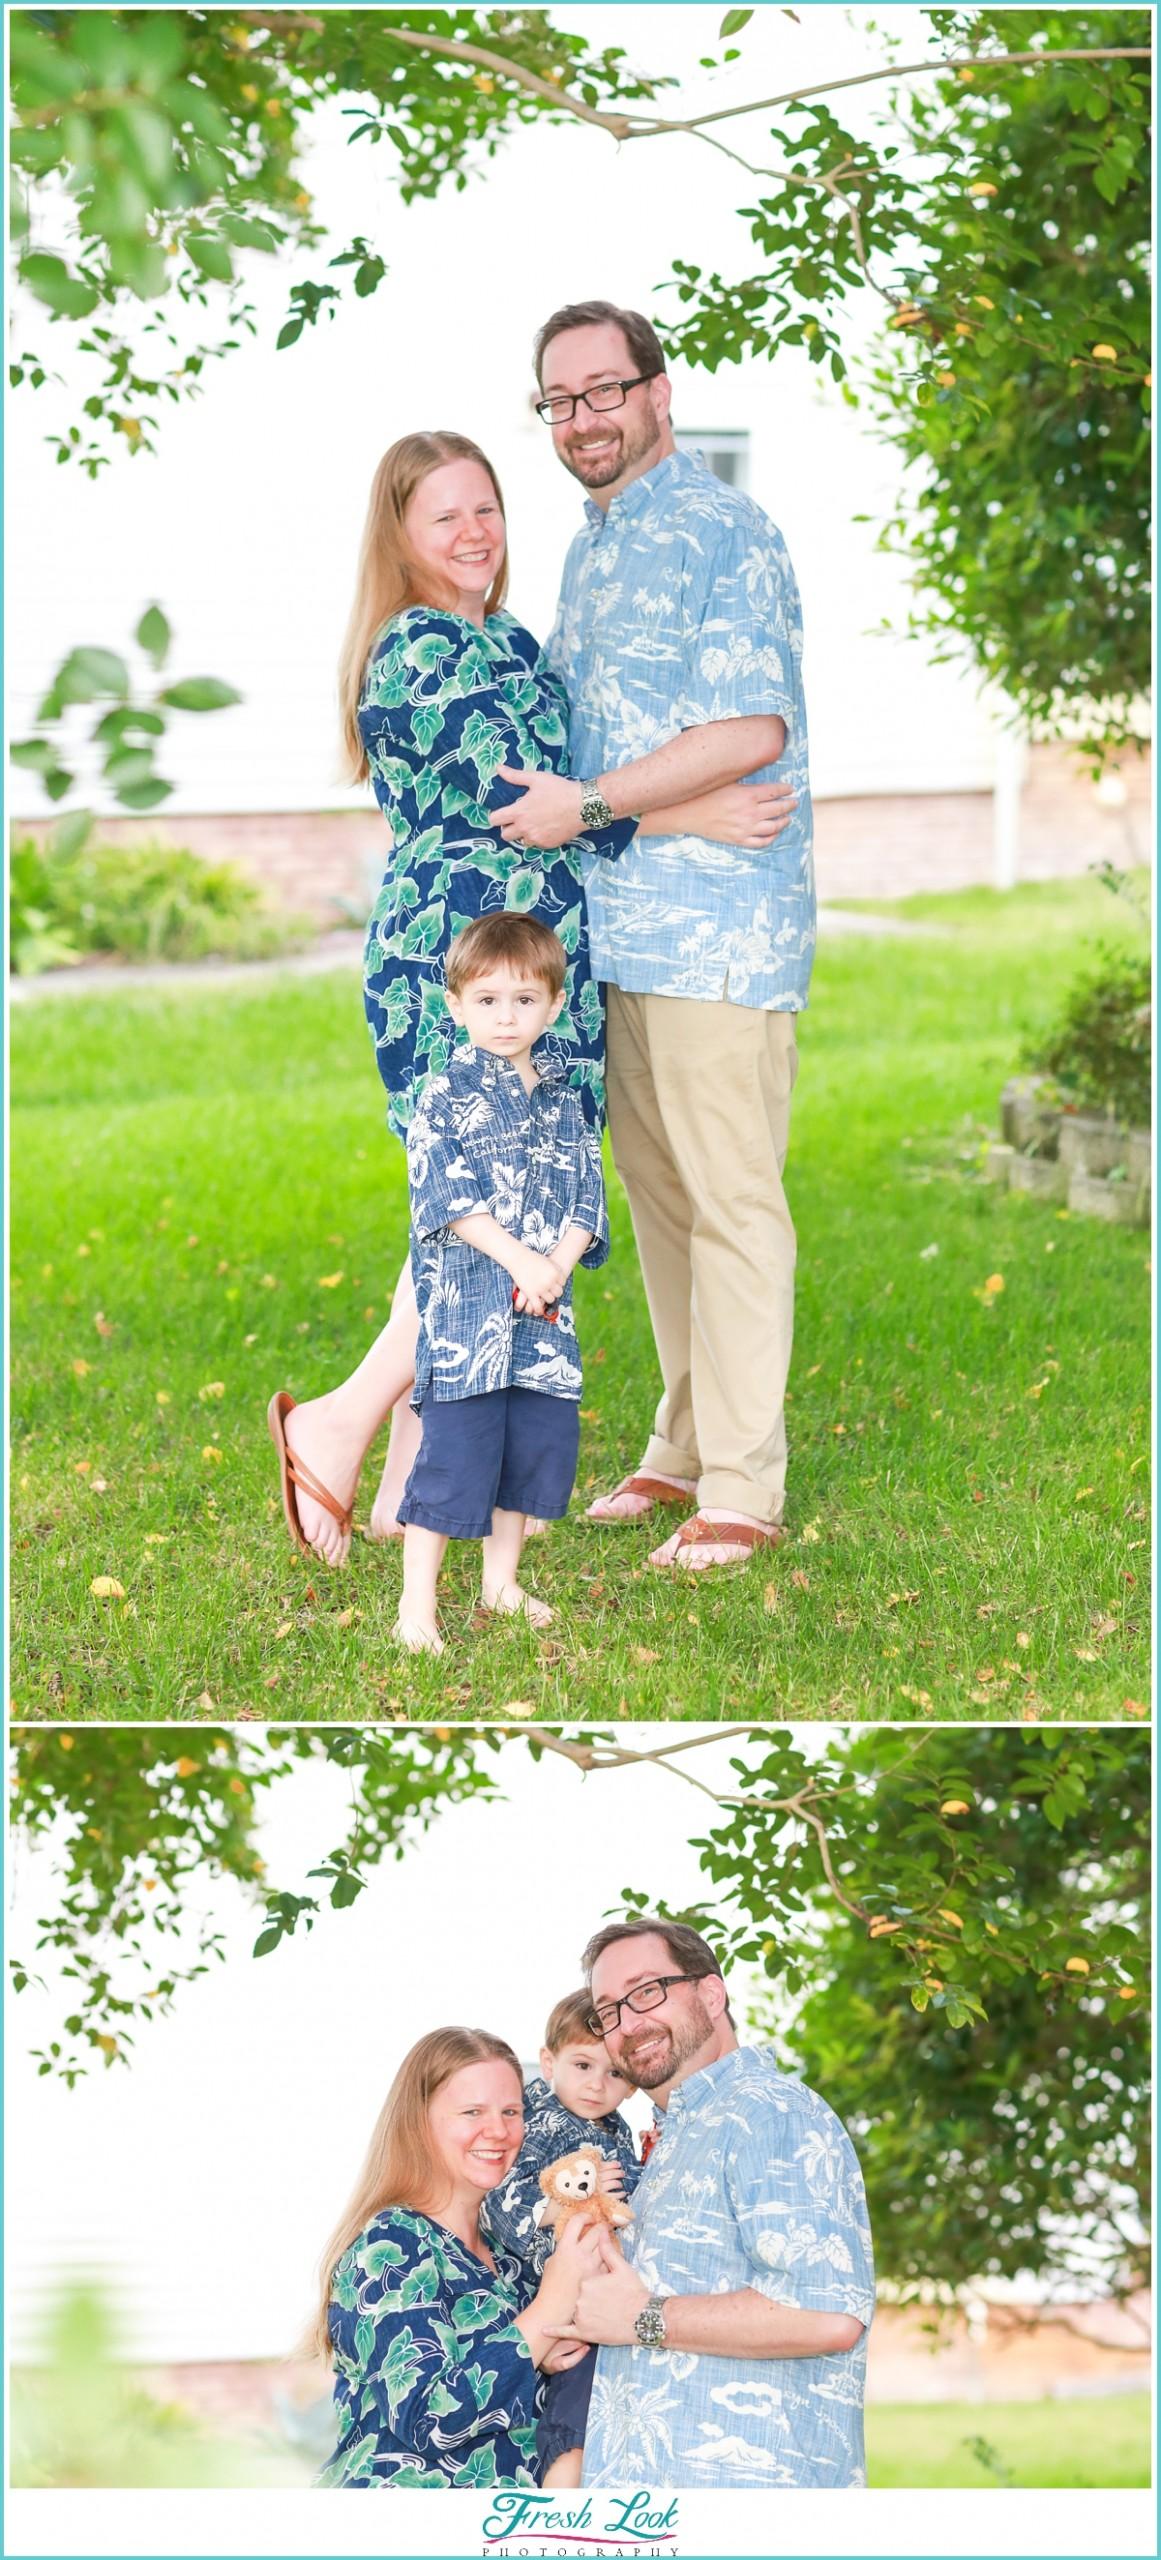 kids photobombing parents